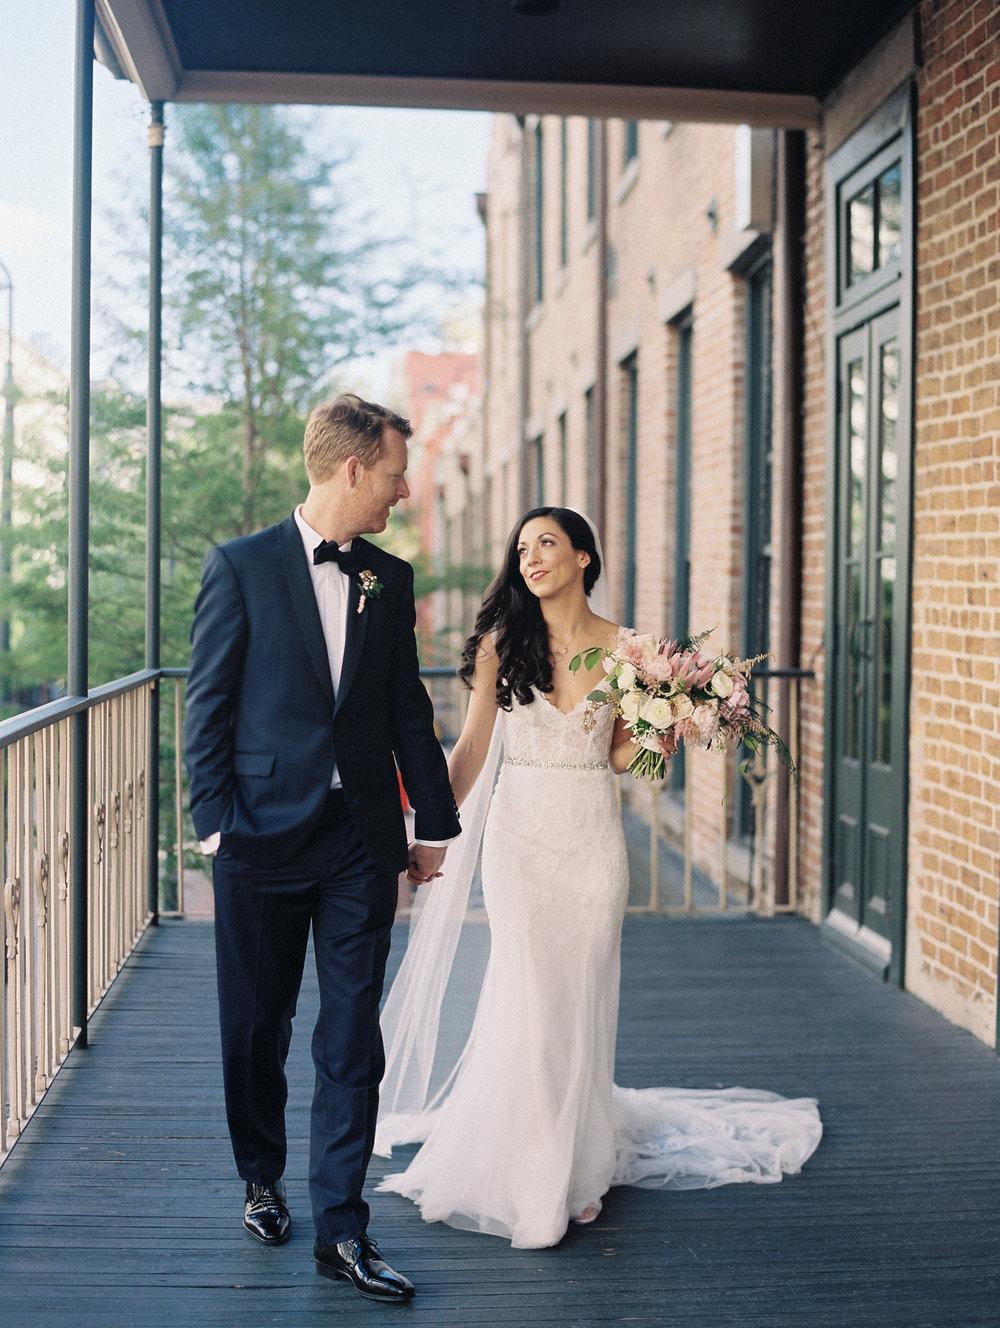 Haley&Will_Portraits_25.jpg